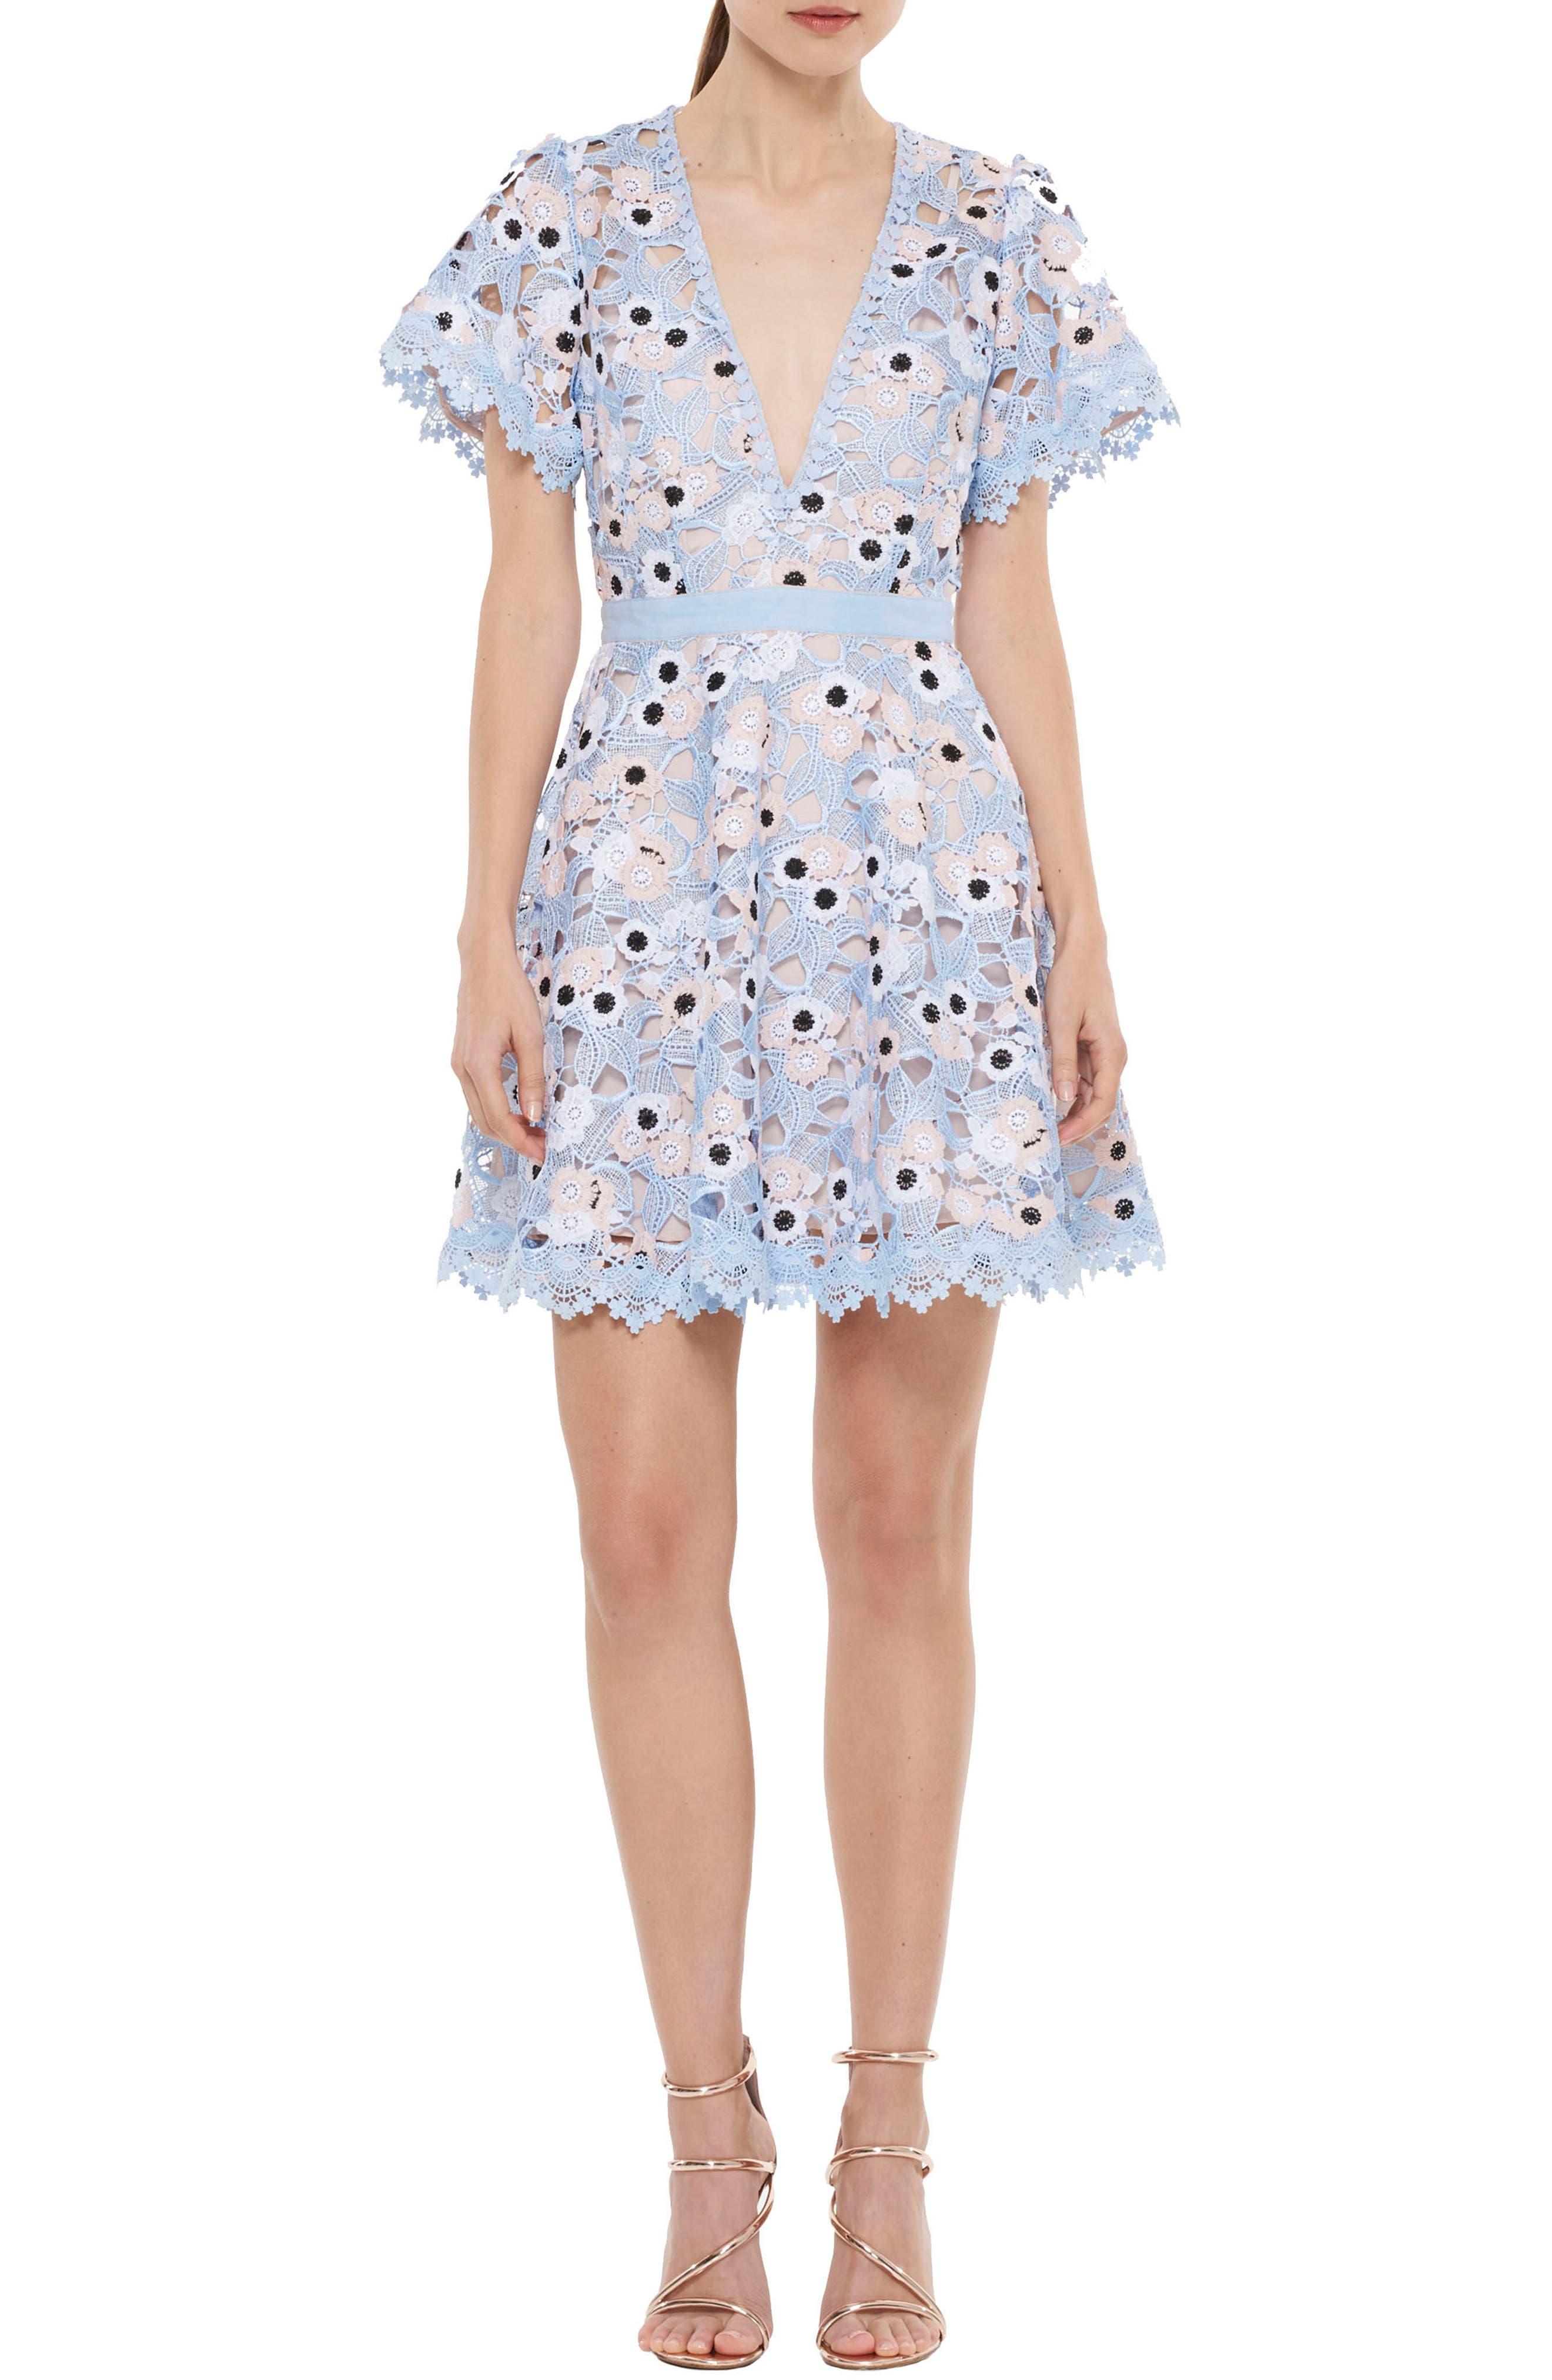 Infatuation Crochet Dress,                         Main,                         color, 450